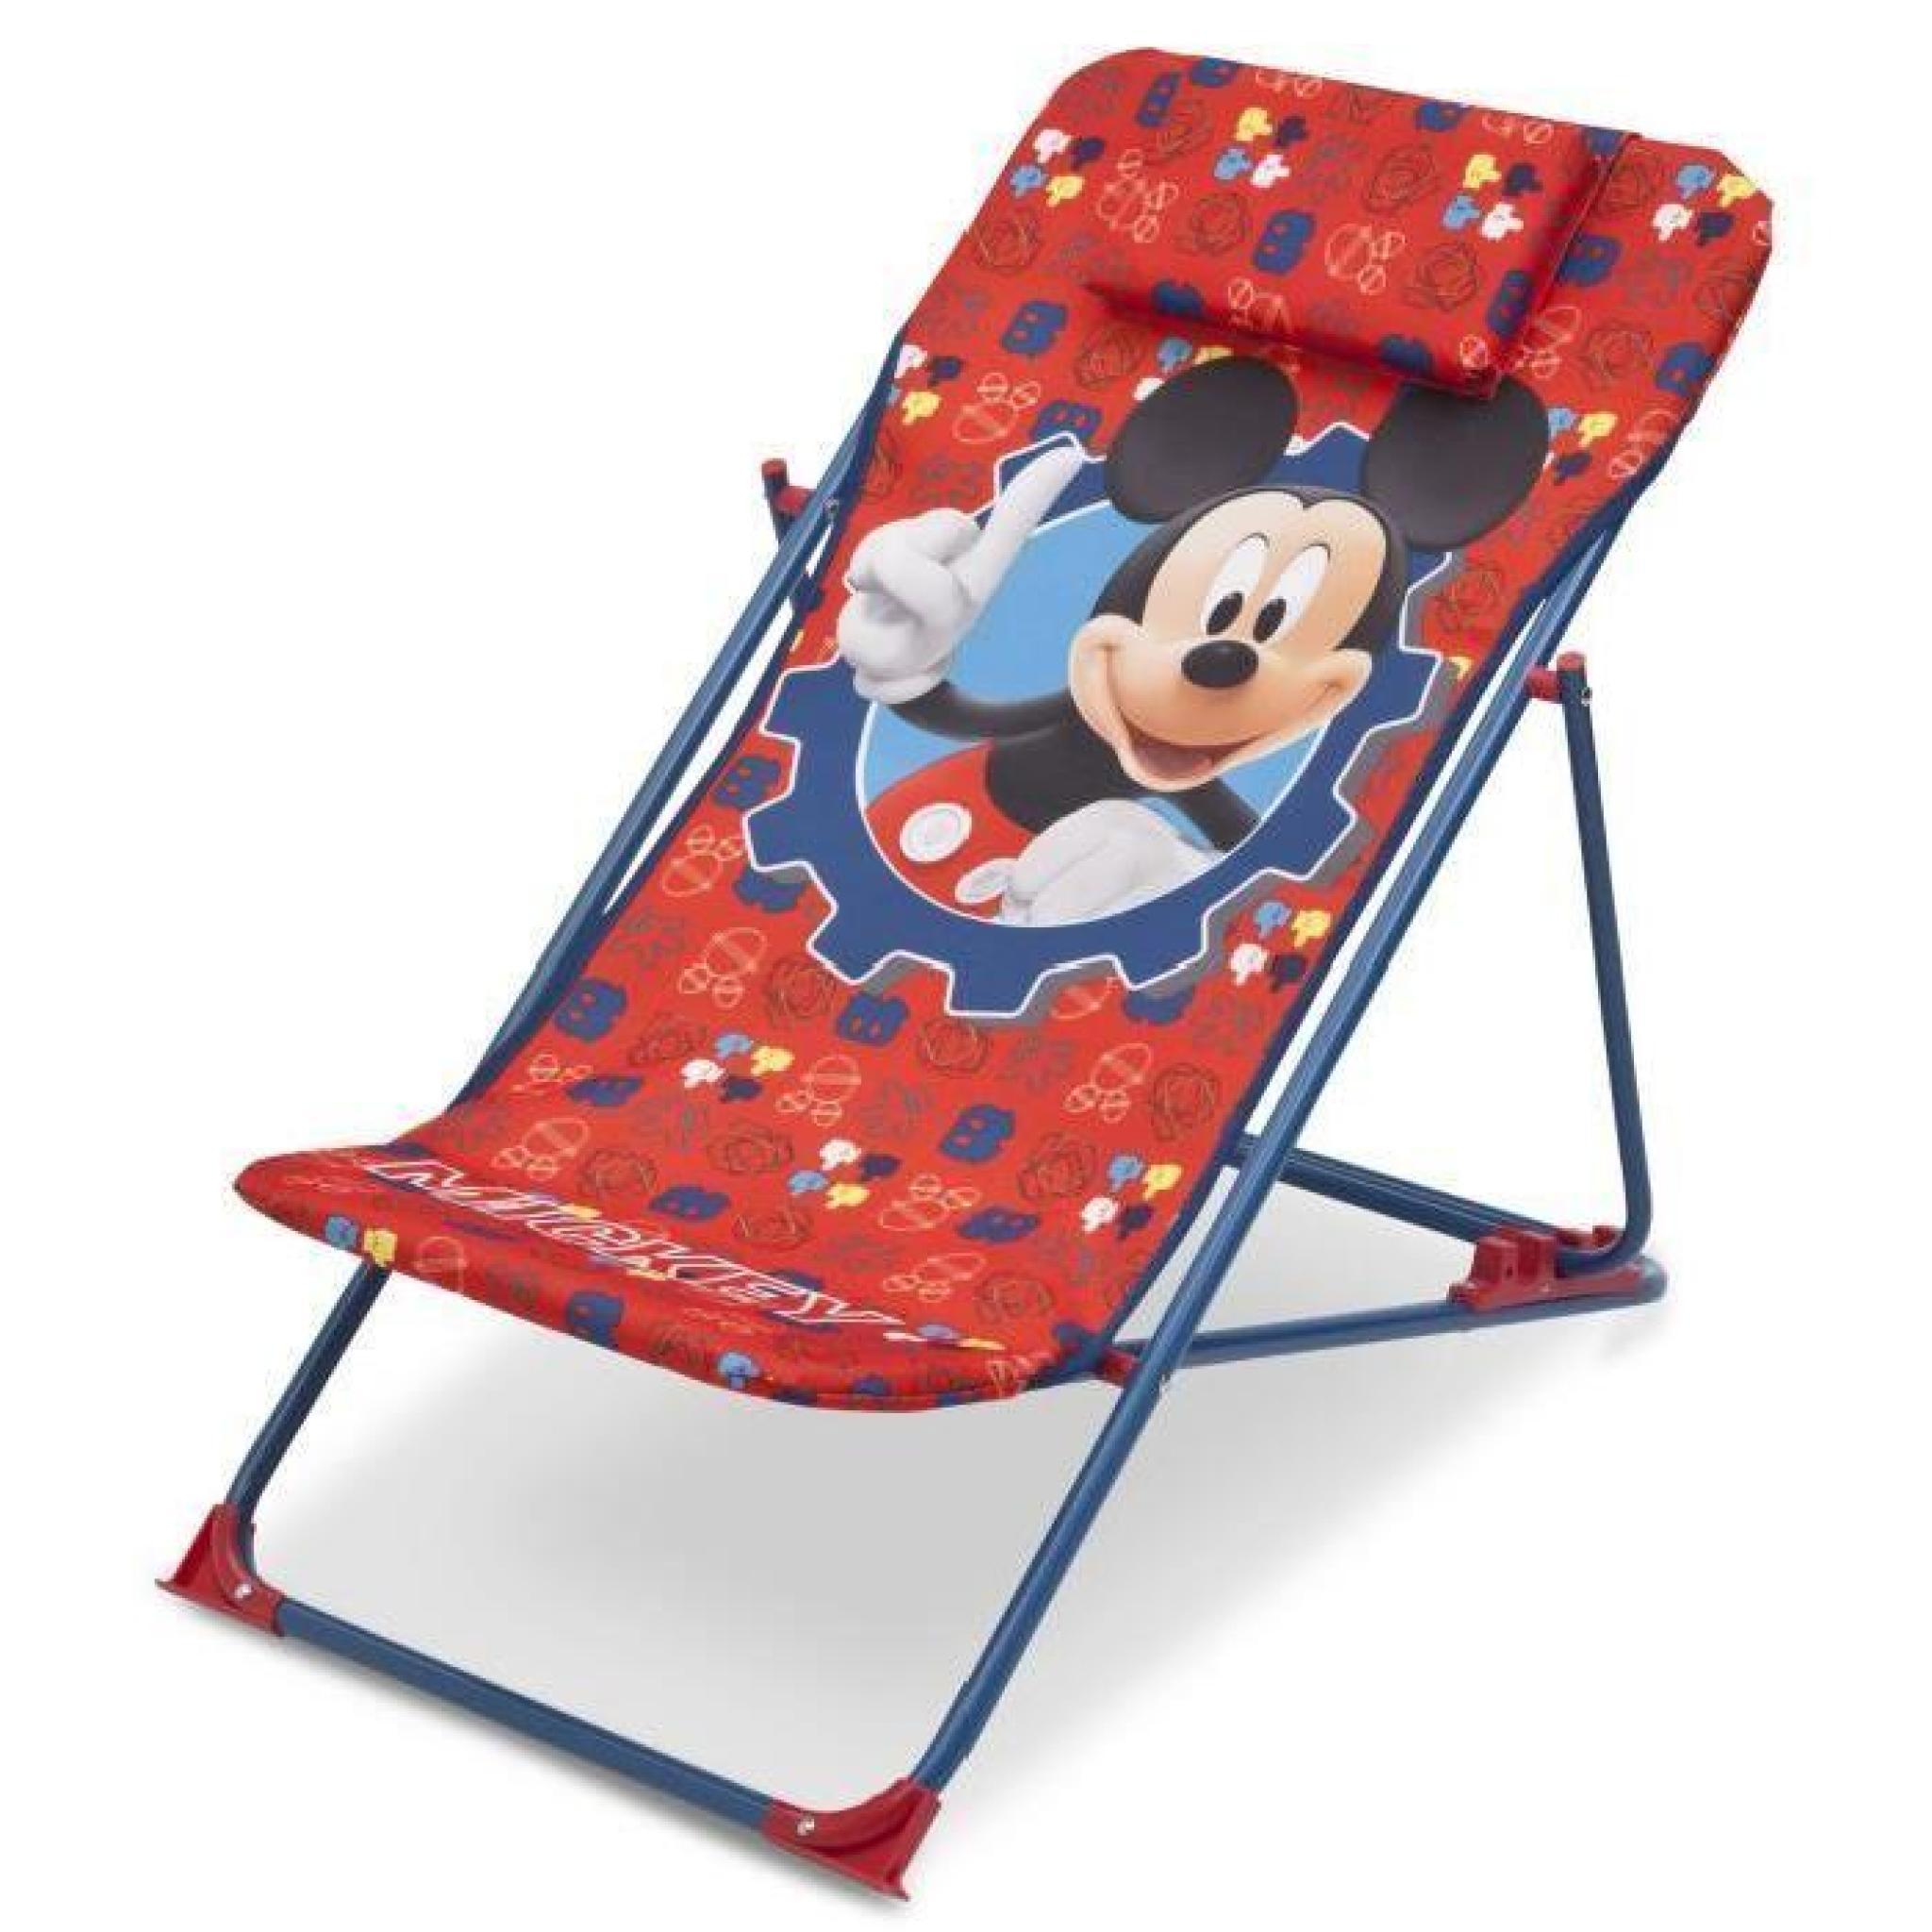 Mickey Achatvente Transat De Enfant Longue Chaise Plage 8nNywOmv0